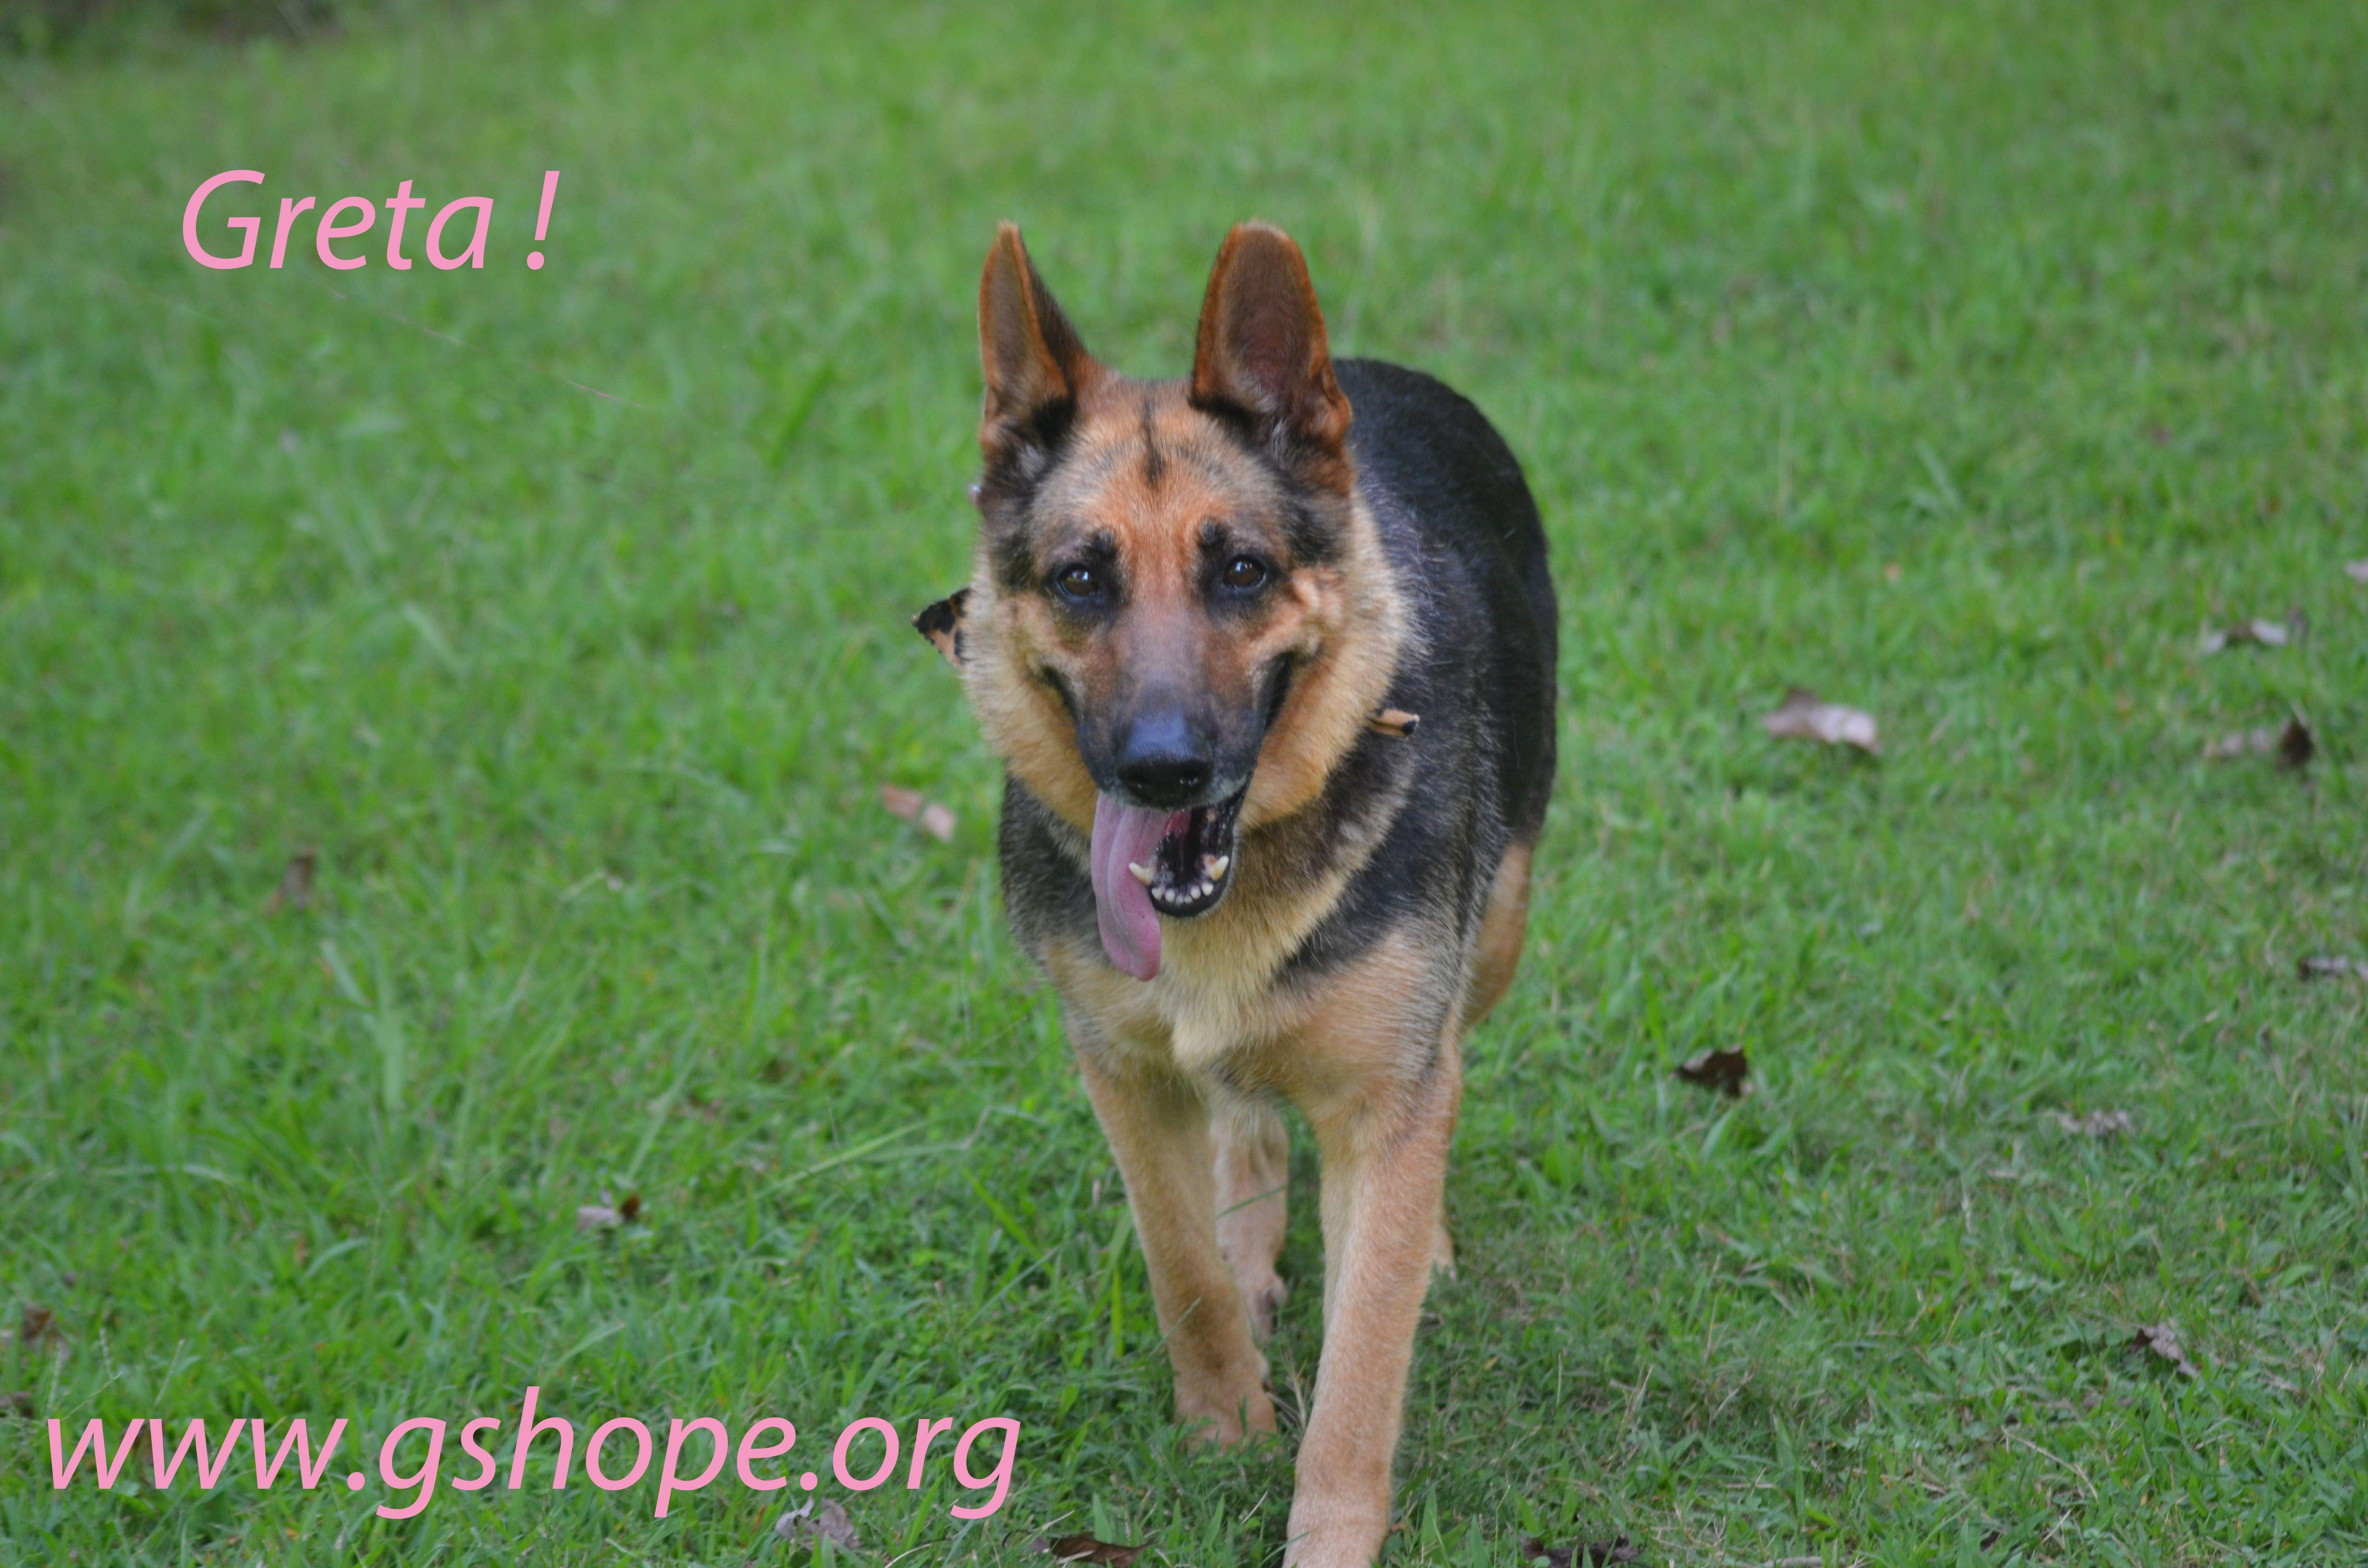 German Shepherd Dog dog for Adoption in Clemmons, NC. ADN